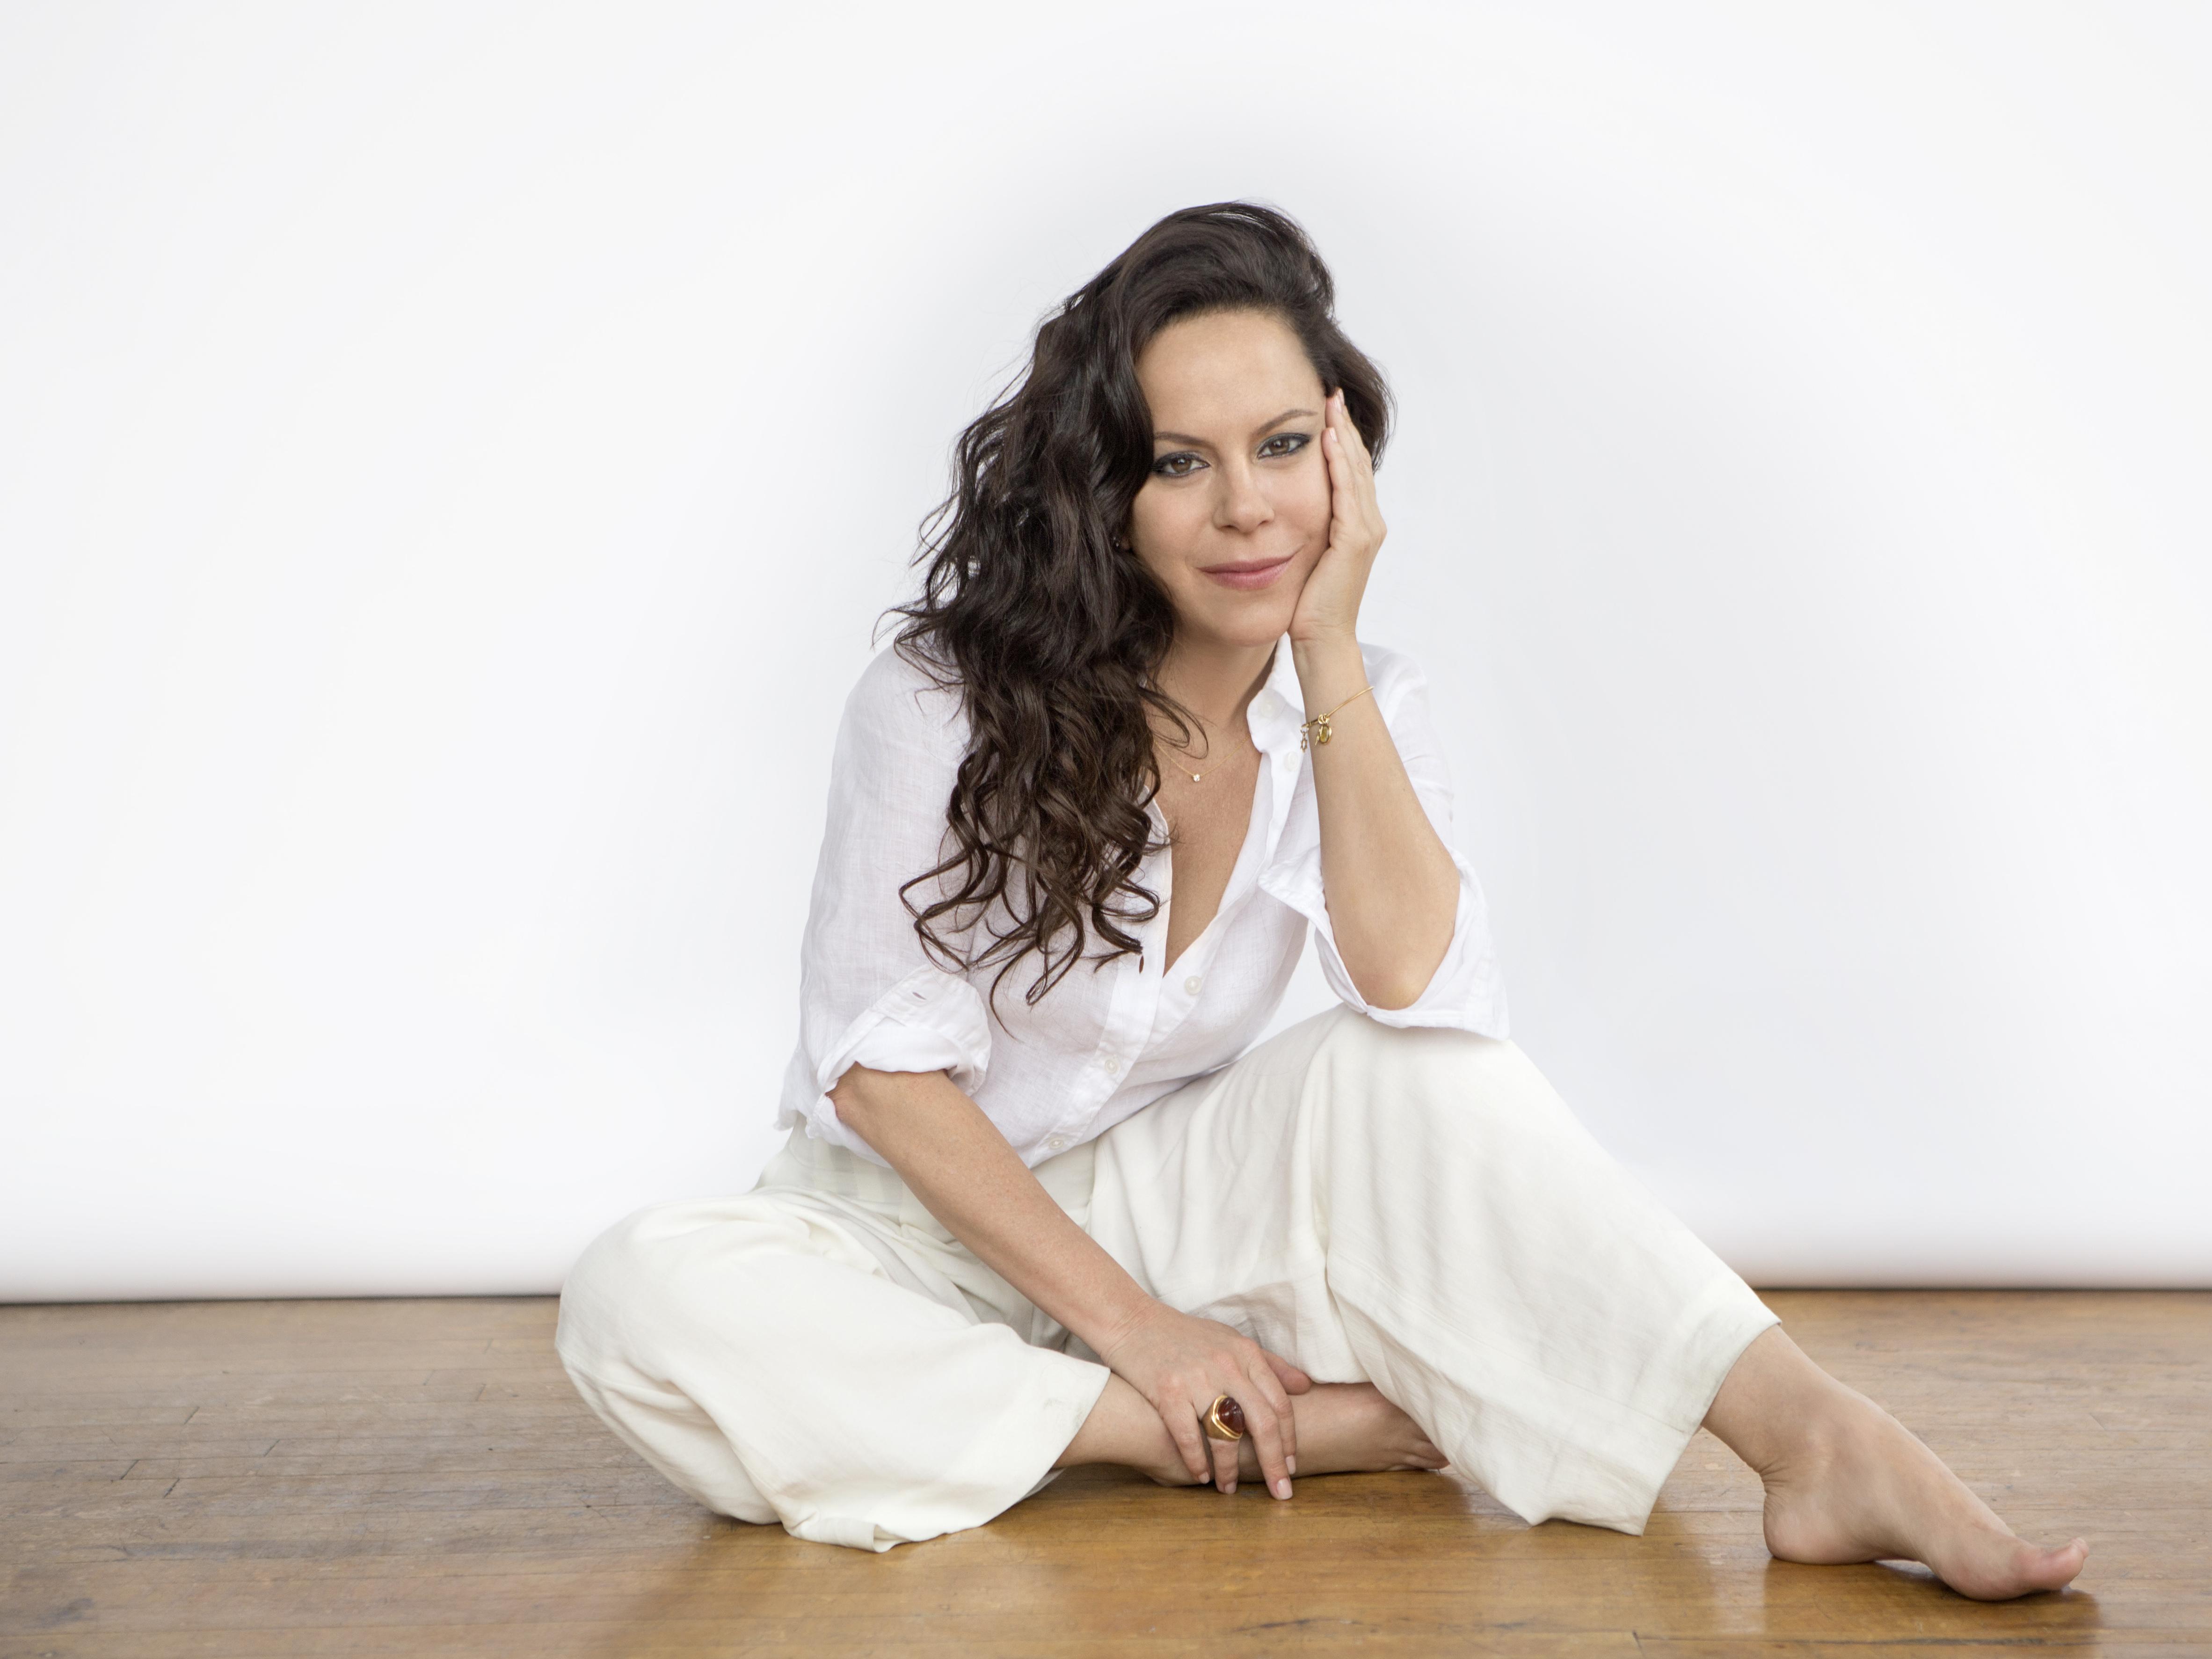 First Listen: Bebel Gilberto, 'Tudo'